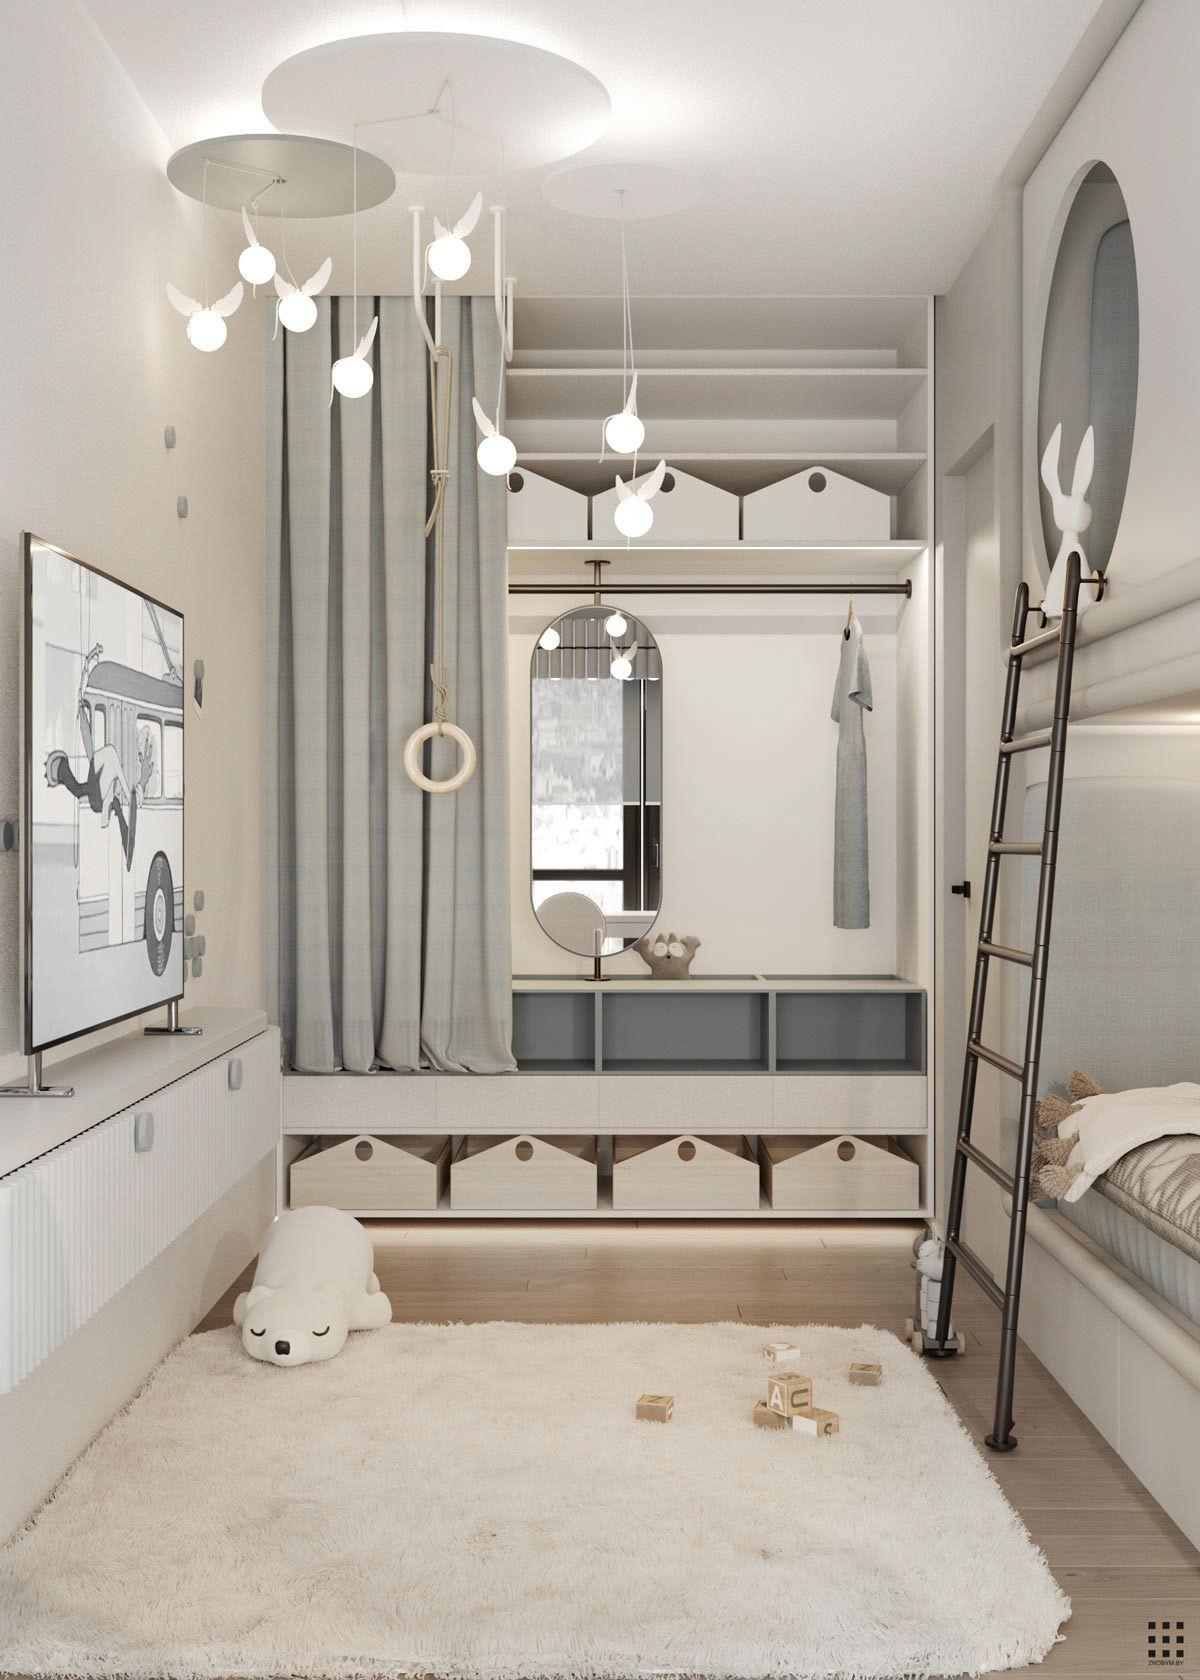 Image May Contain Bathroom Indoor And Wall Kids Room Interior Design Luxury Baby Room Luxury Kids Bedroom Baby bedroom interior design